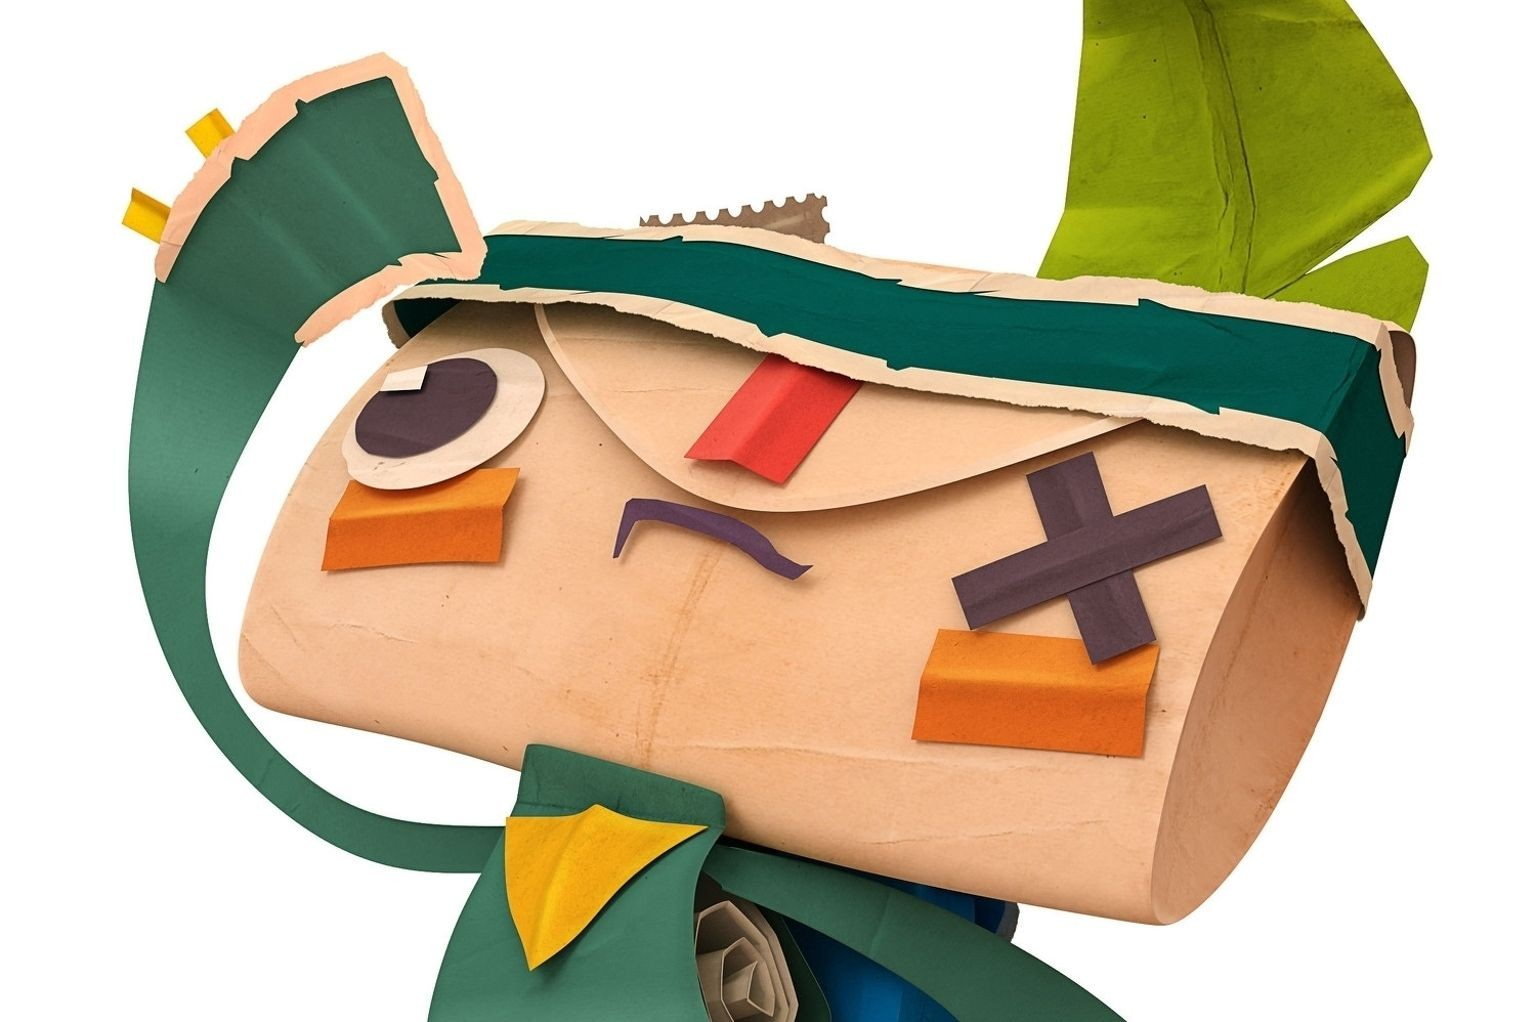 Papercraft Bulbasaur Kuvahaun Tulos Haulle Tearaway Iota Papercraft